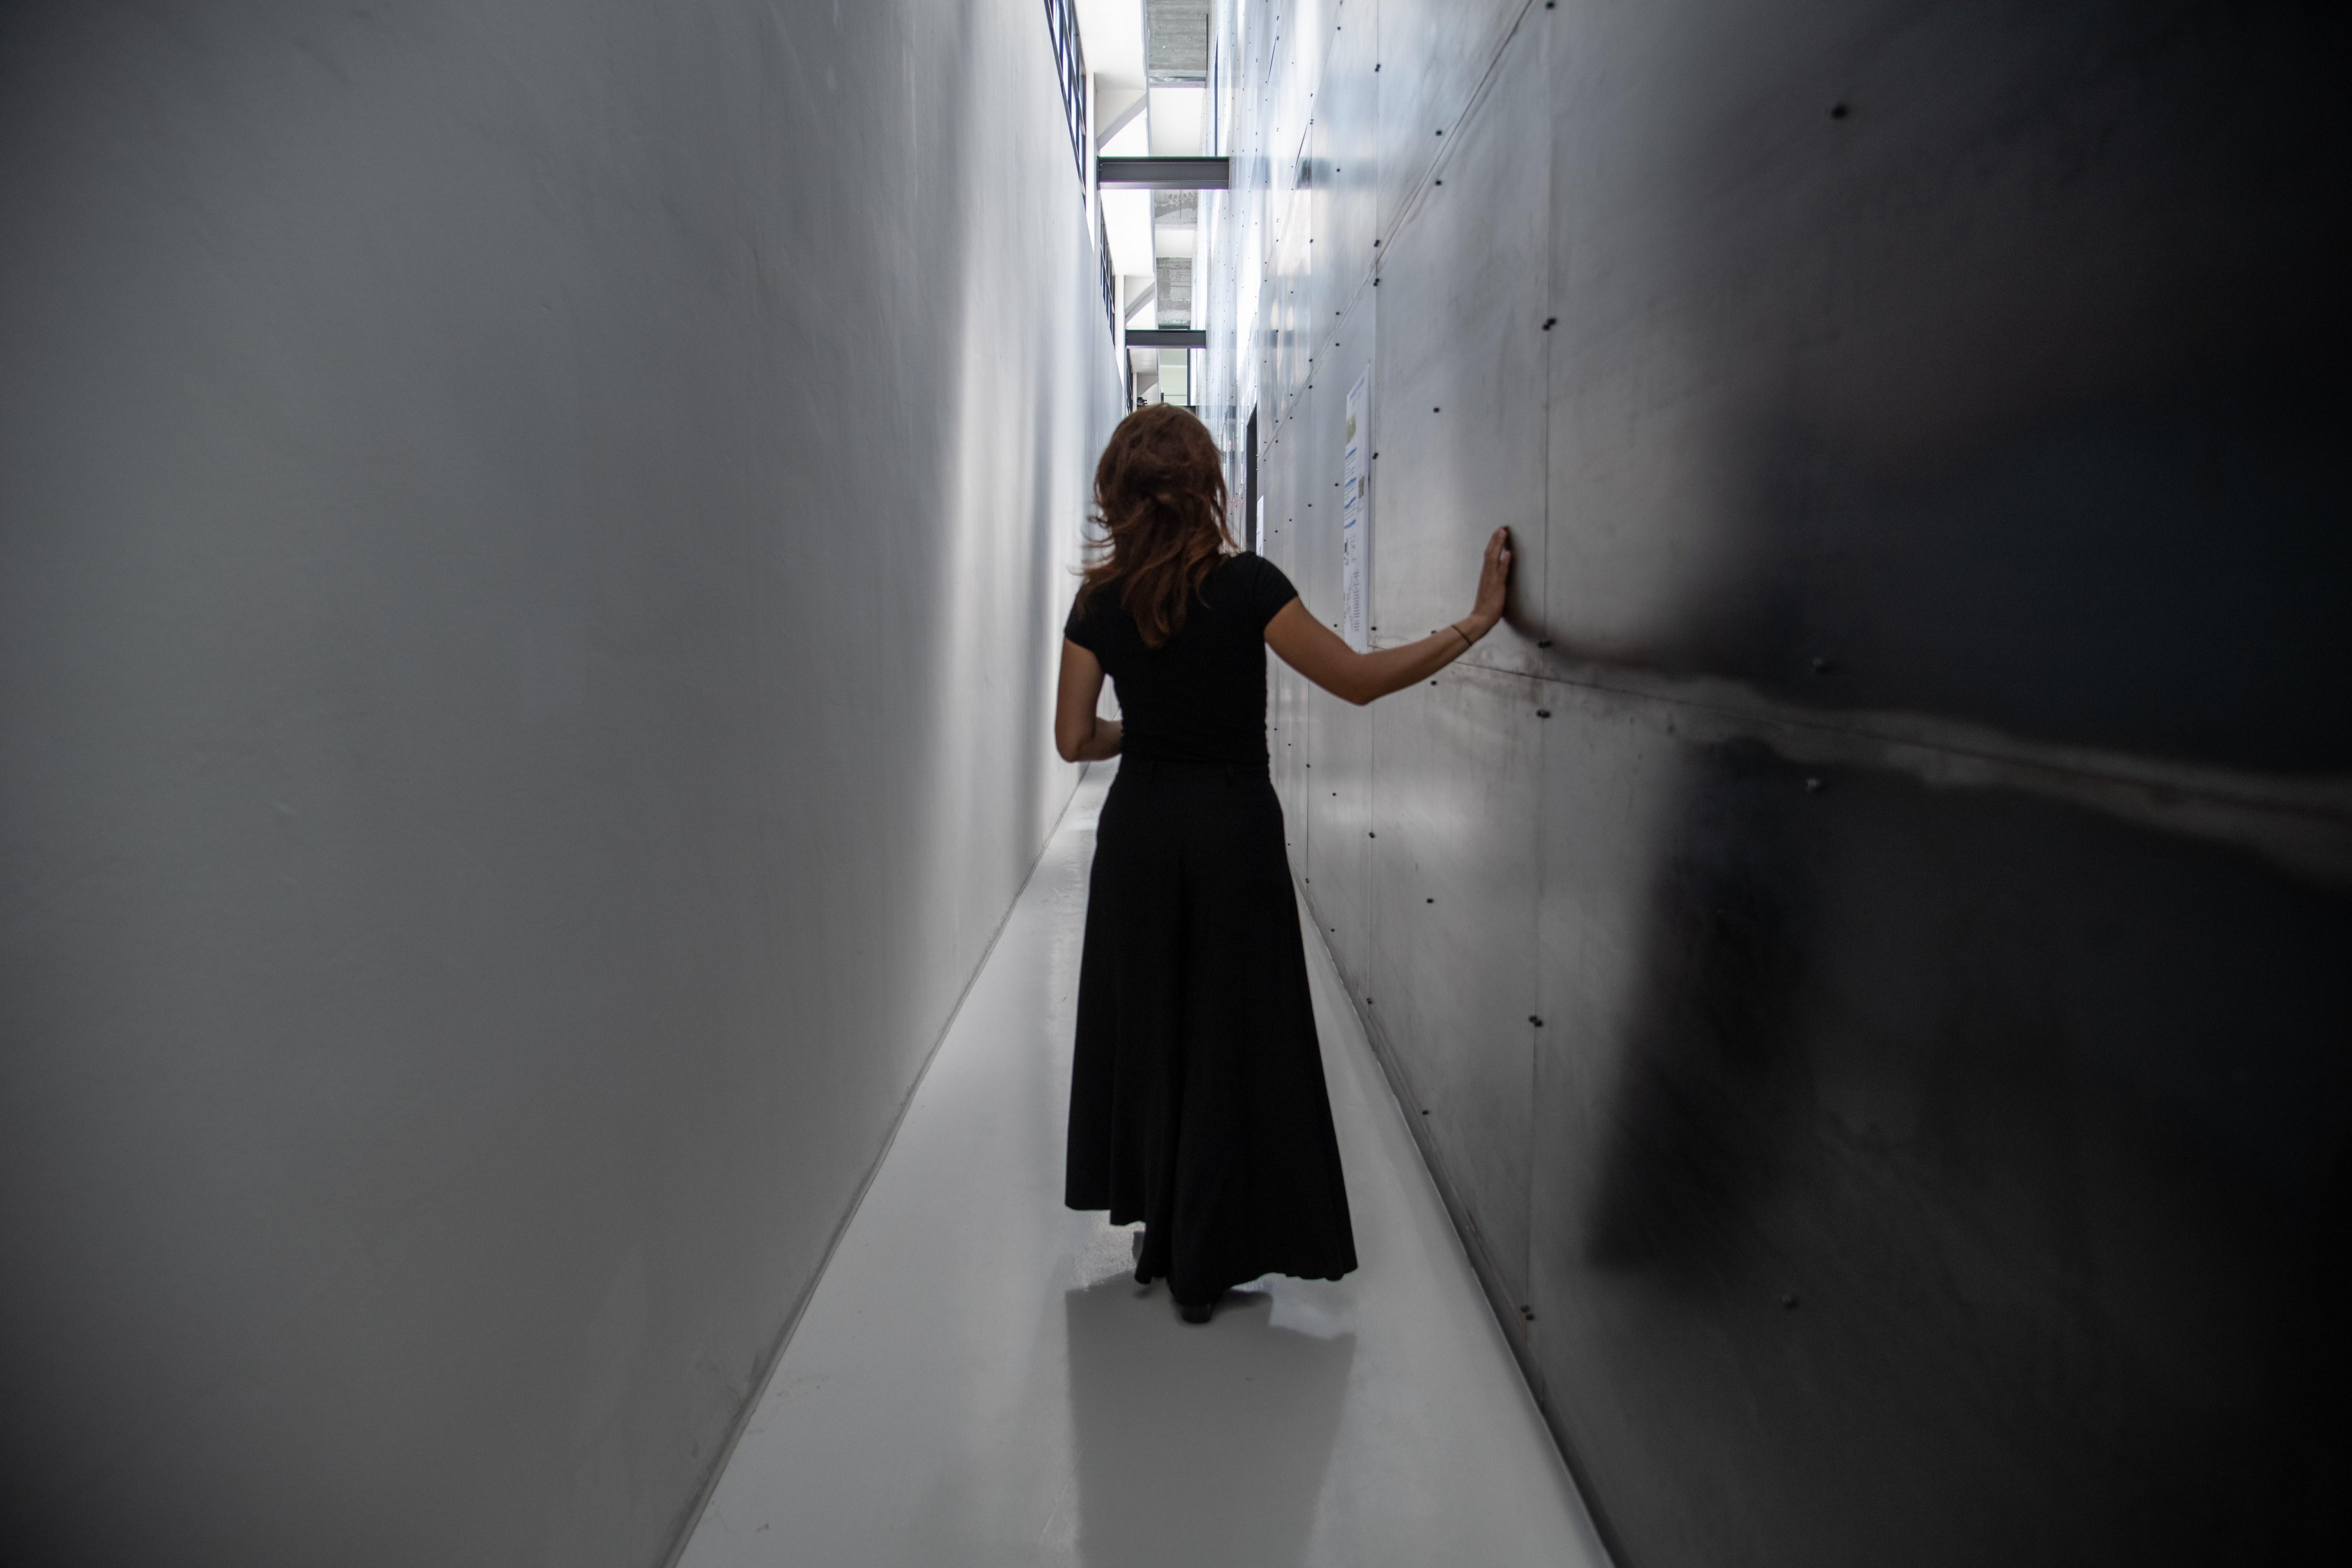 https://www.danzaurbana.eu/festival/wp-content/uploads/20180717_Square_LorenzoBianchiHoesh_BolzanoDanza_NOI_phAndreaMacchia_2556_REV.jpg